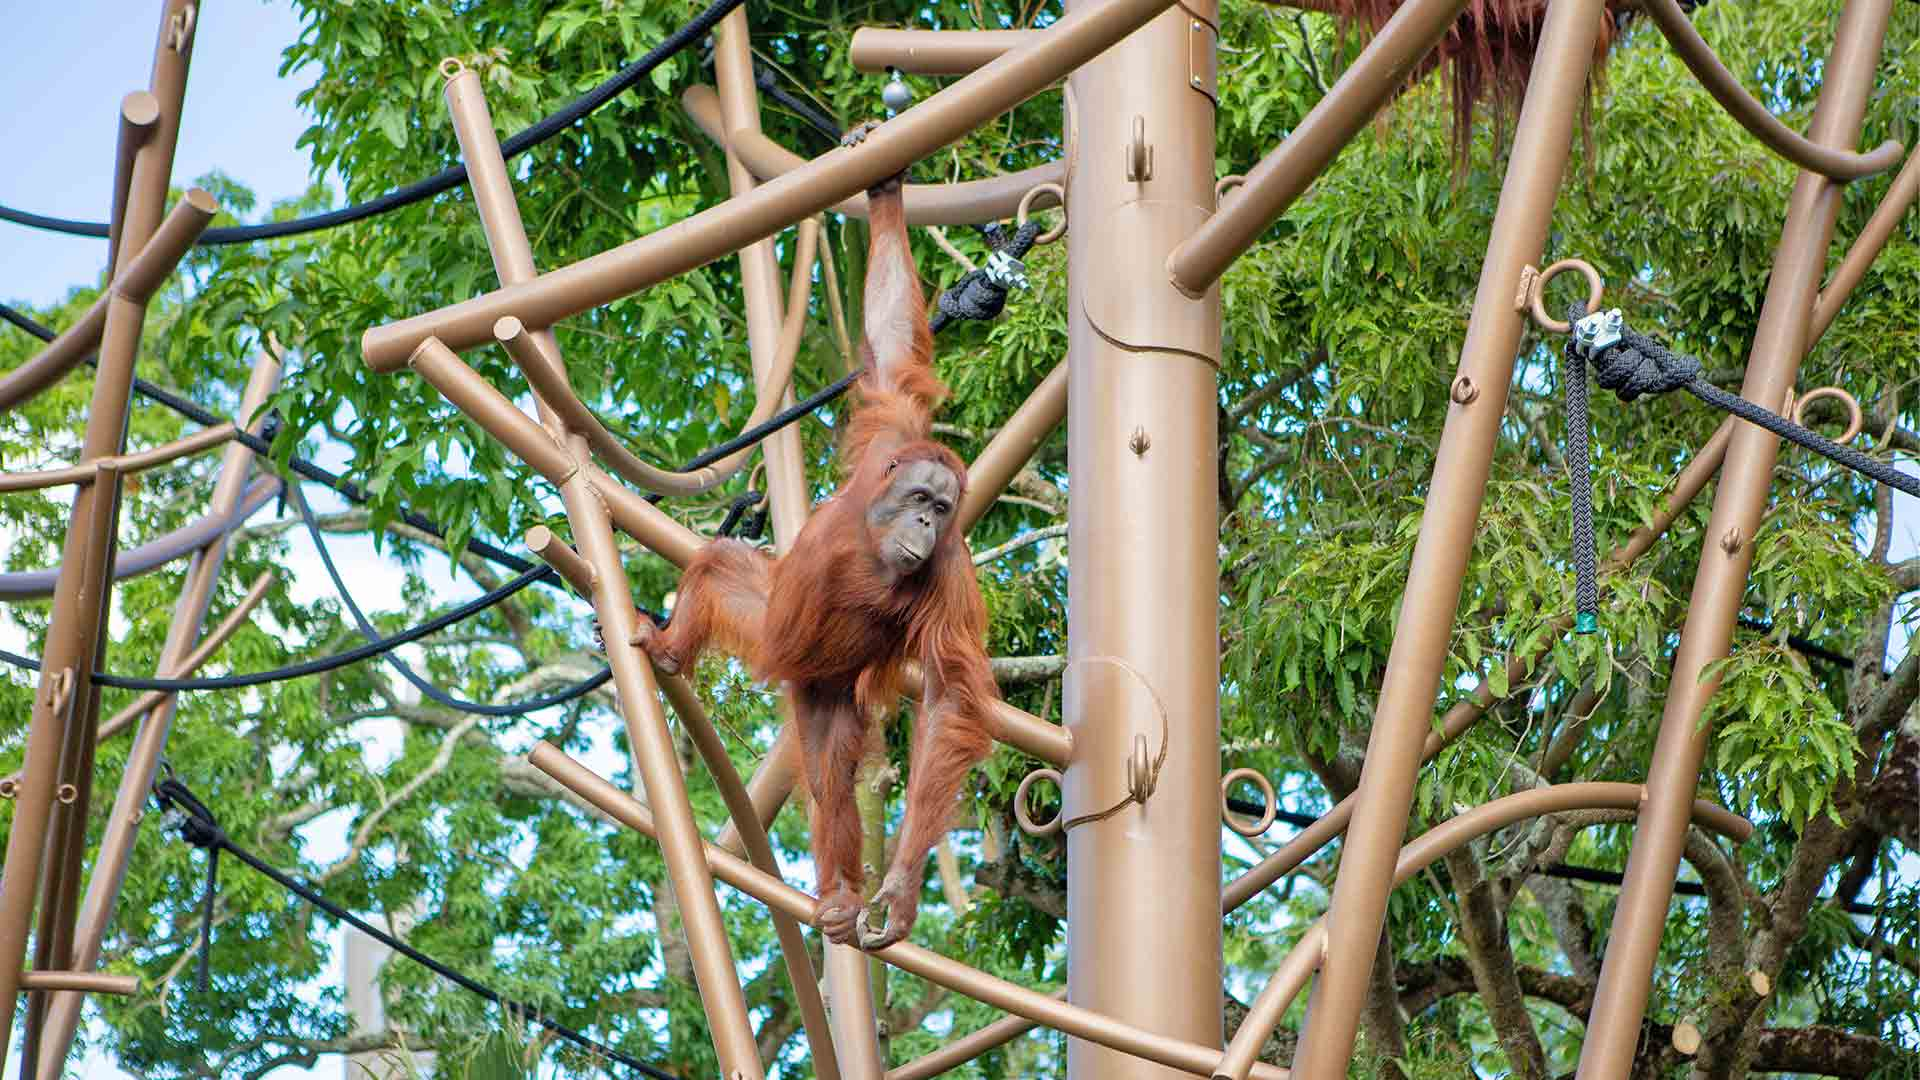 https://rfacdn.nz/zoo/assets/media/wanita-on-jungle-track-gallery-2.jpg